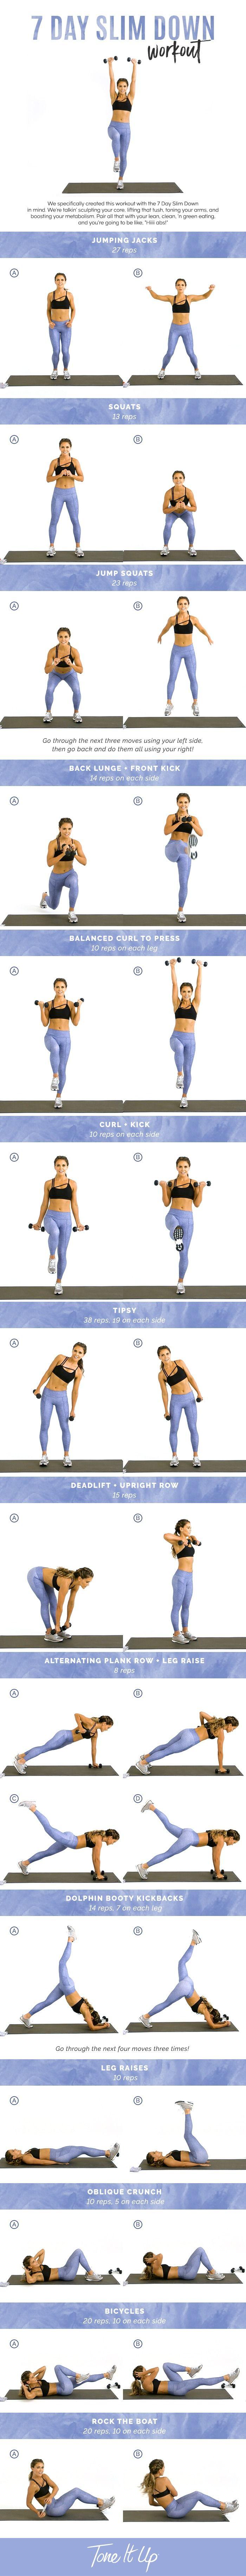 Beverly hills weight loss center laredo tx image 8